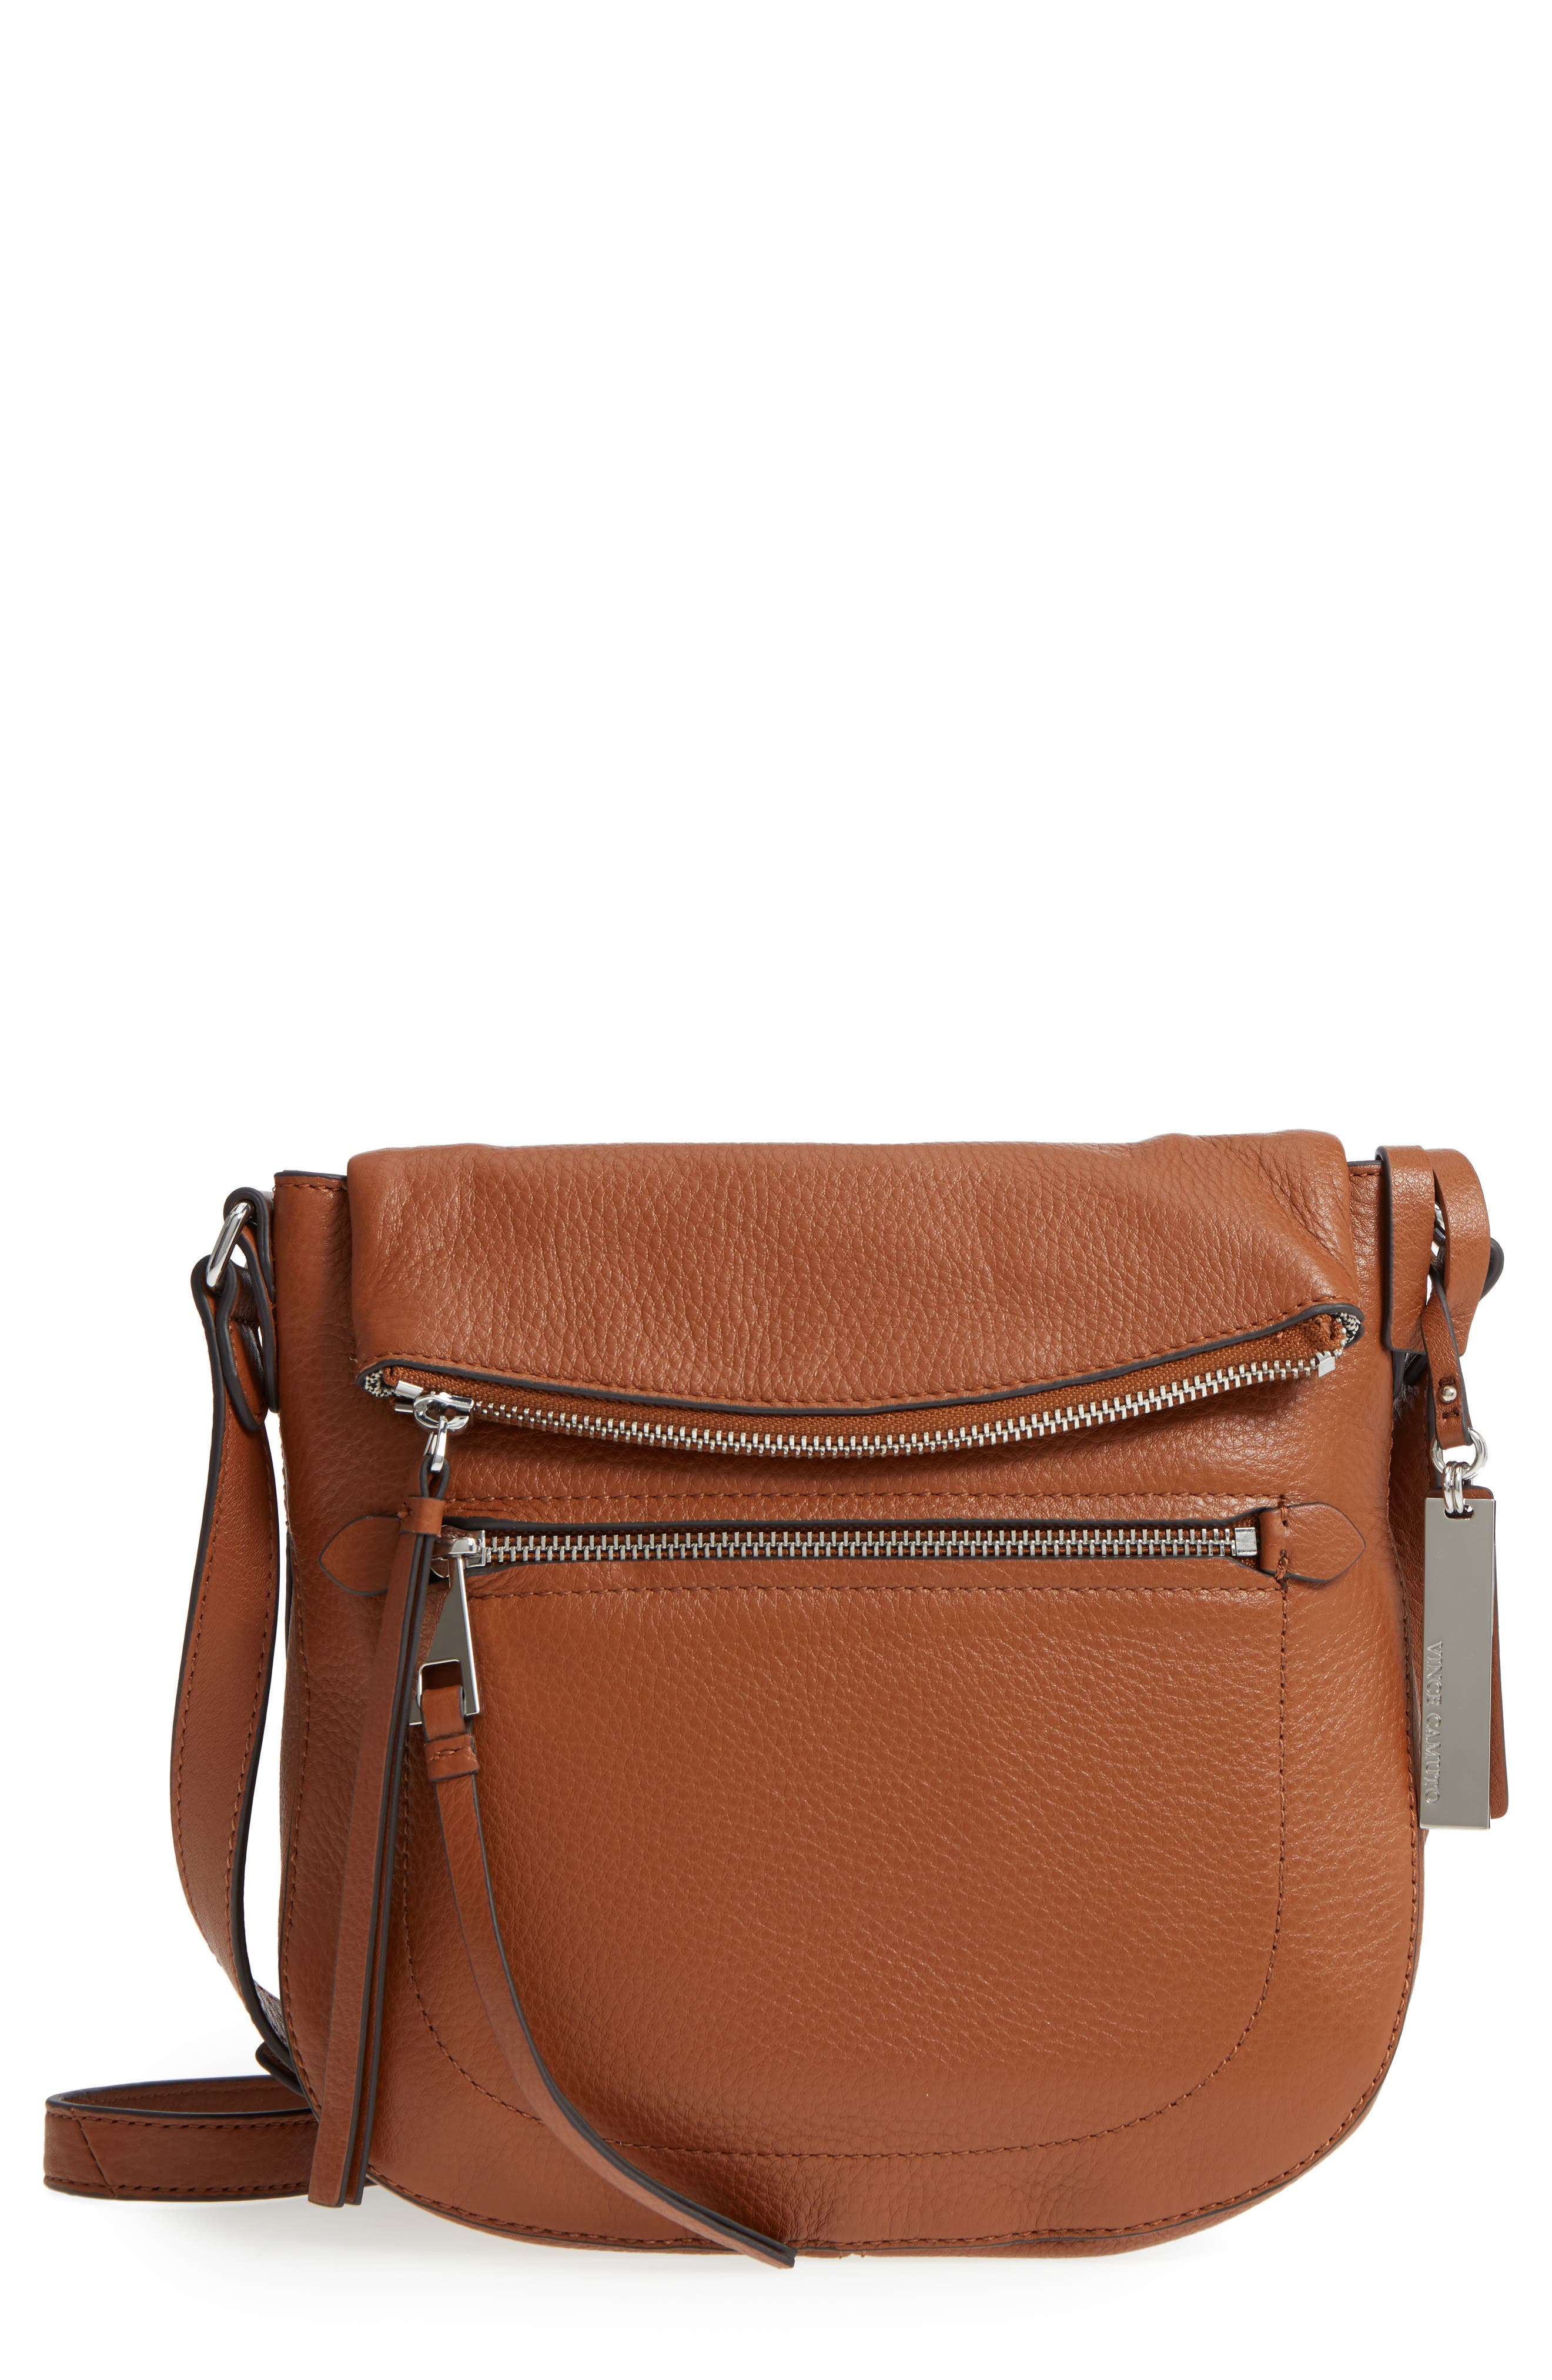 'Tala' Leather Crossbody Bag,                         Main,                         color, 203